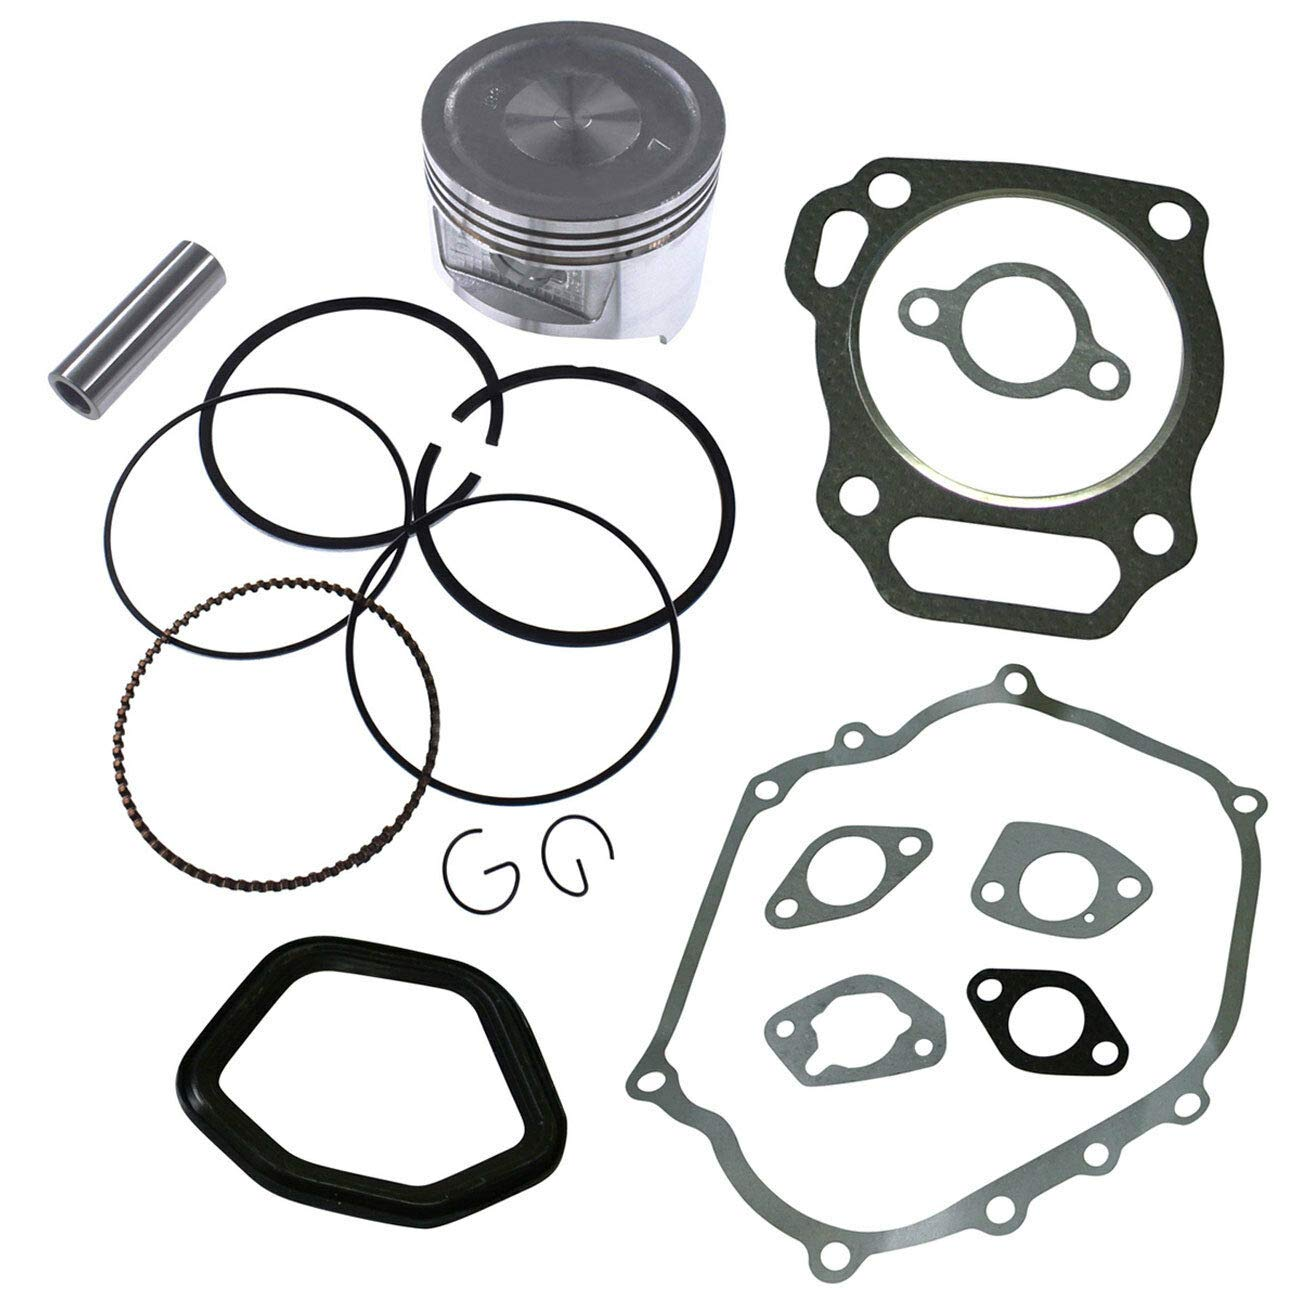 FidgetKute Piston Kit Parts to Fits Honda GX390 13HP Engine Motor Replace by FidgetKute